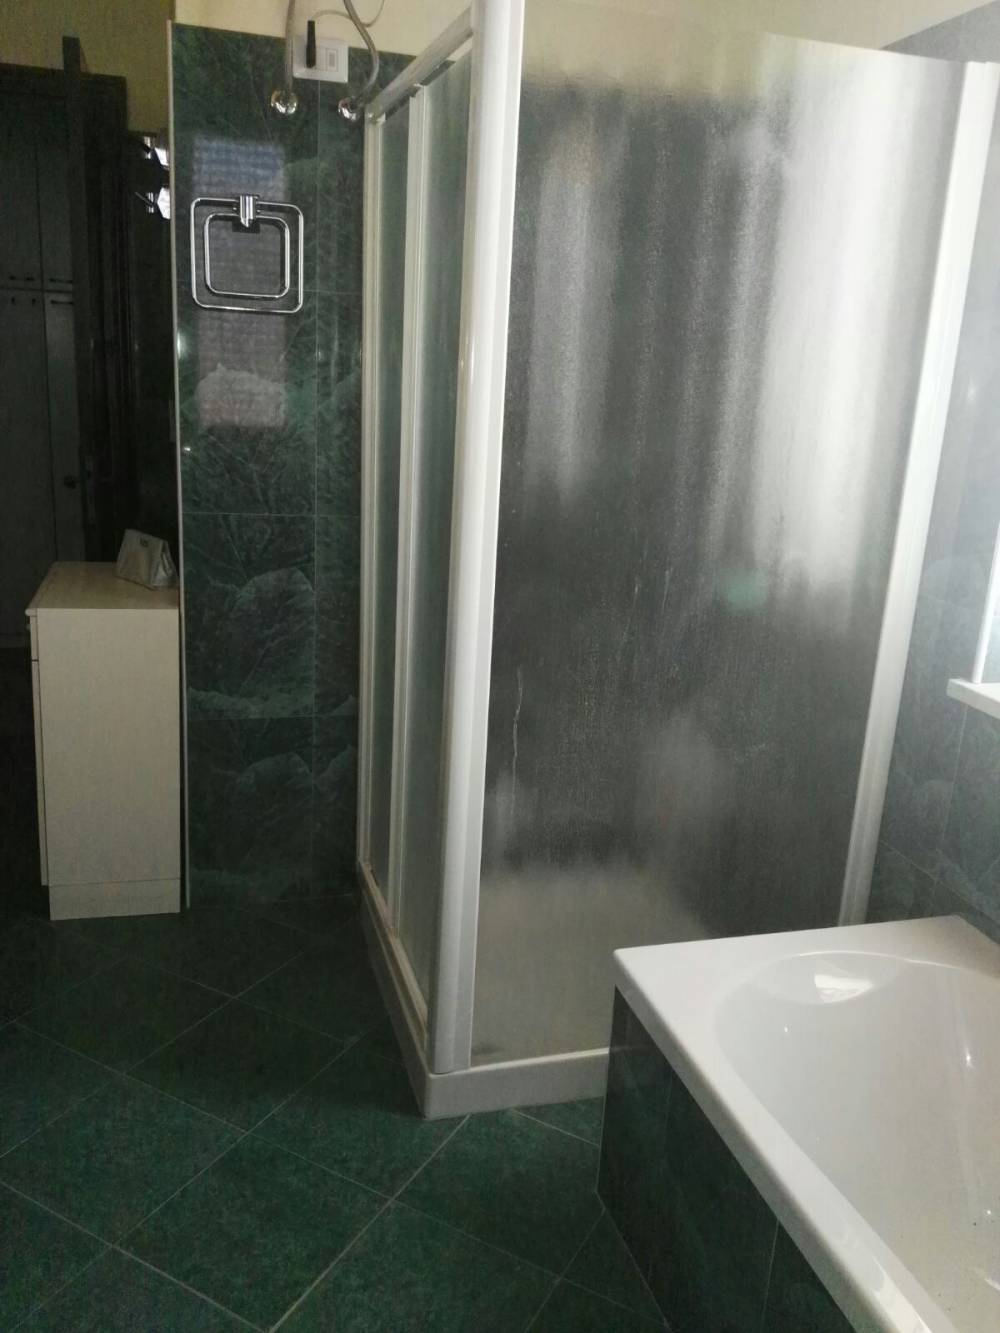 Foto n. 2 del bagno - La doccia